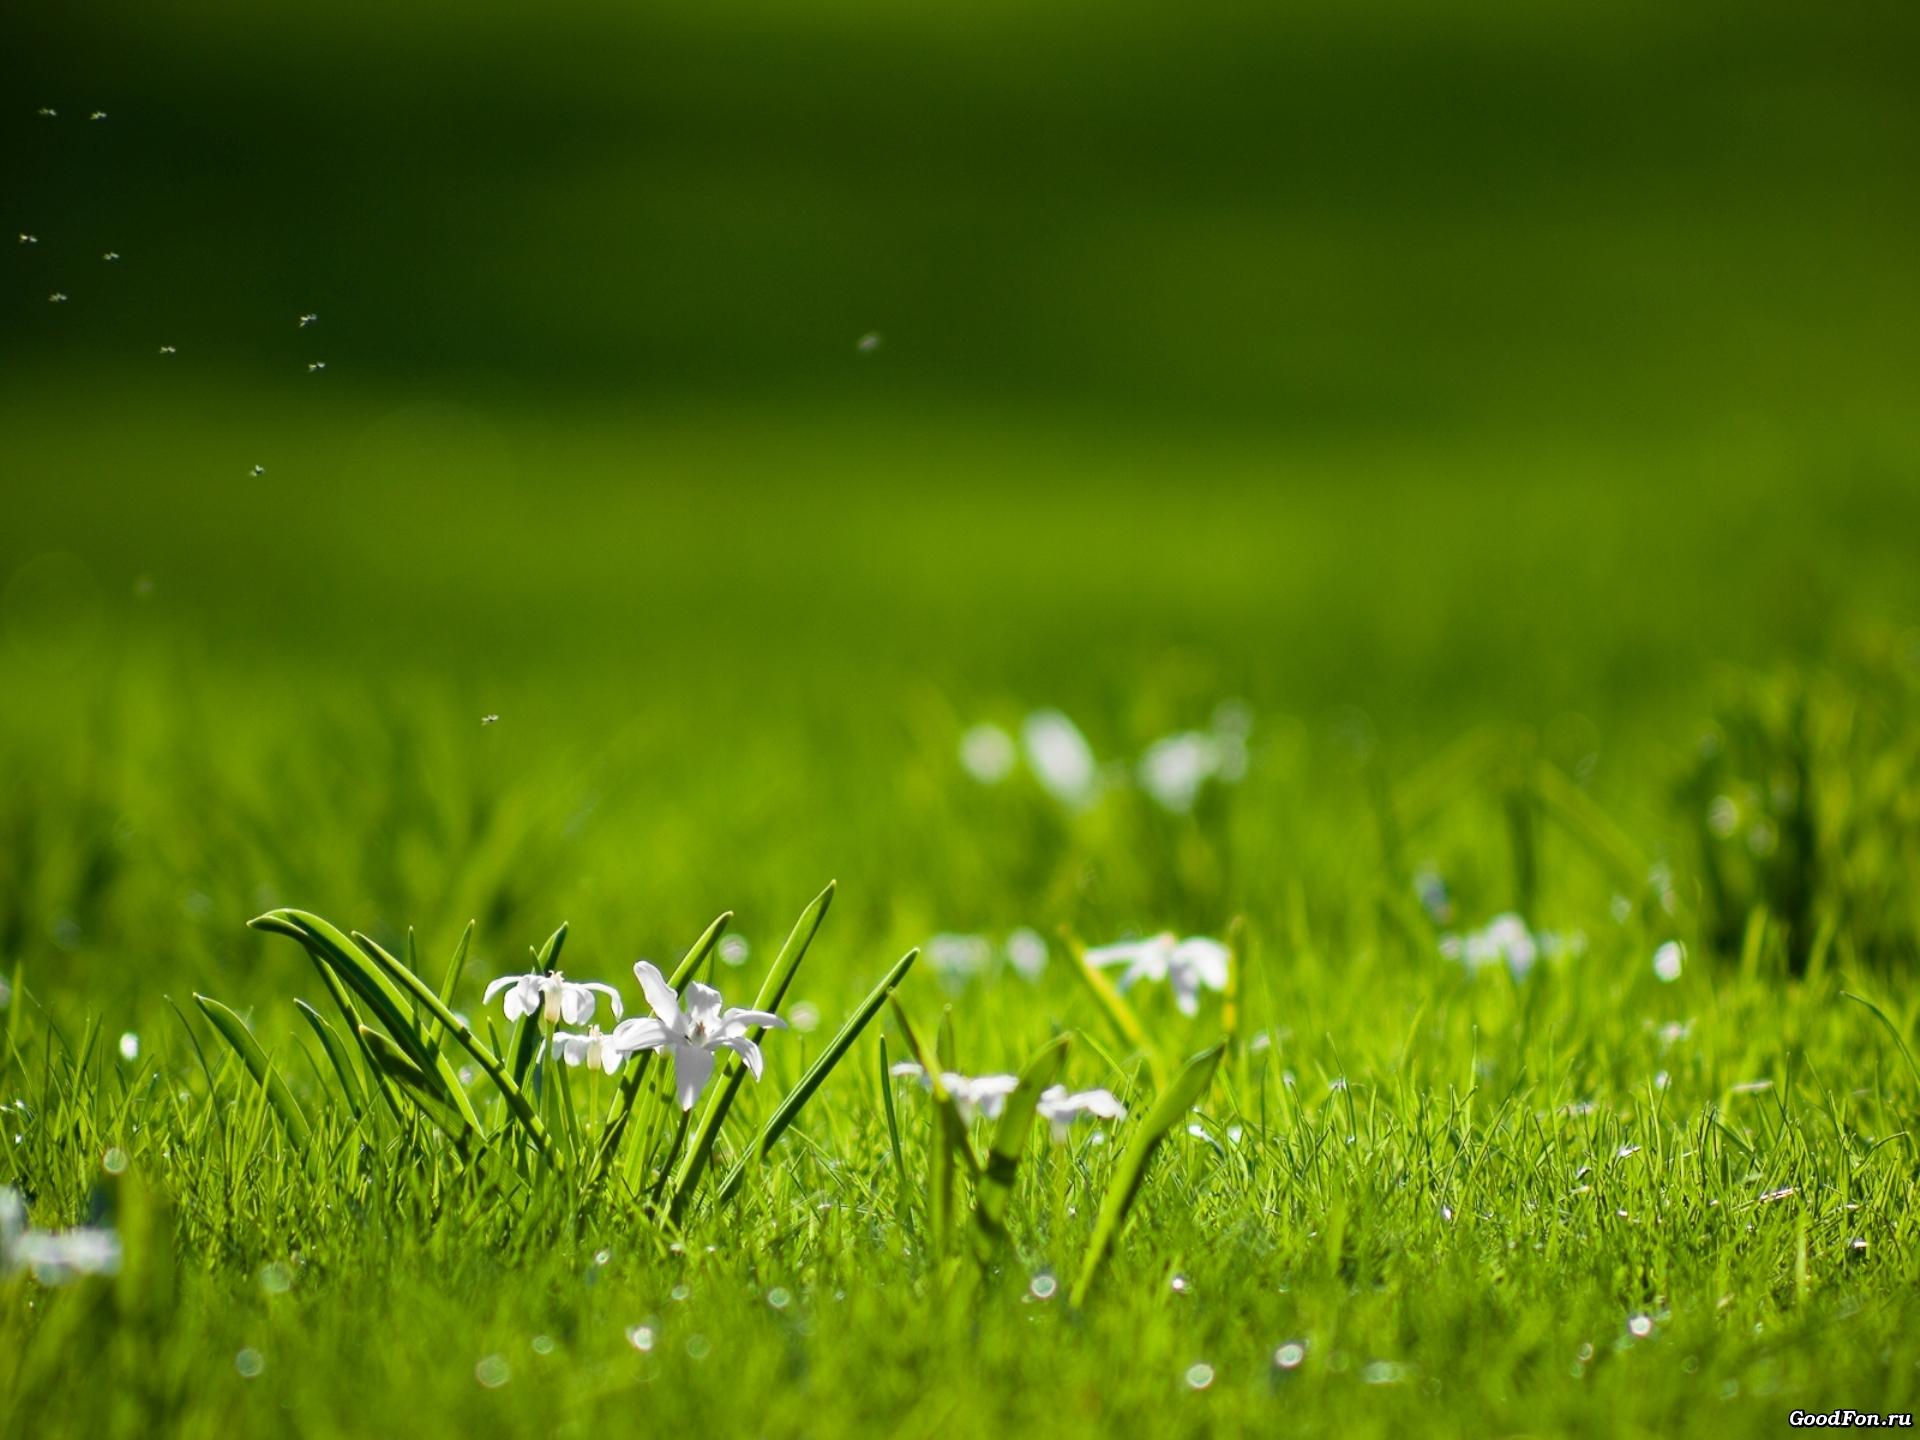 мак трава поляна Mac grass glade бесплатно